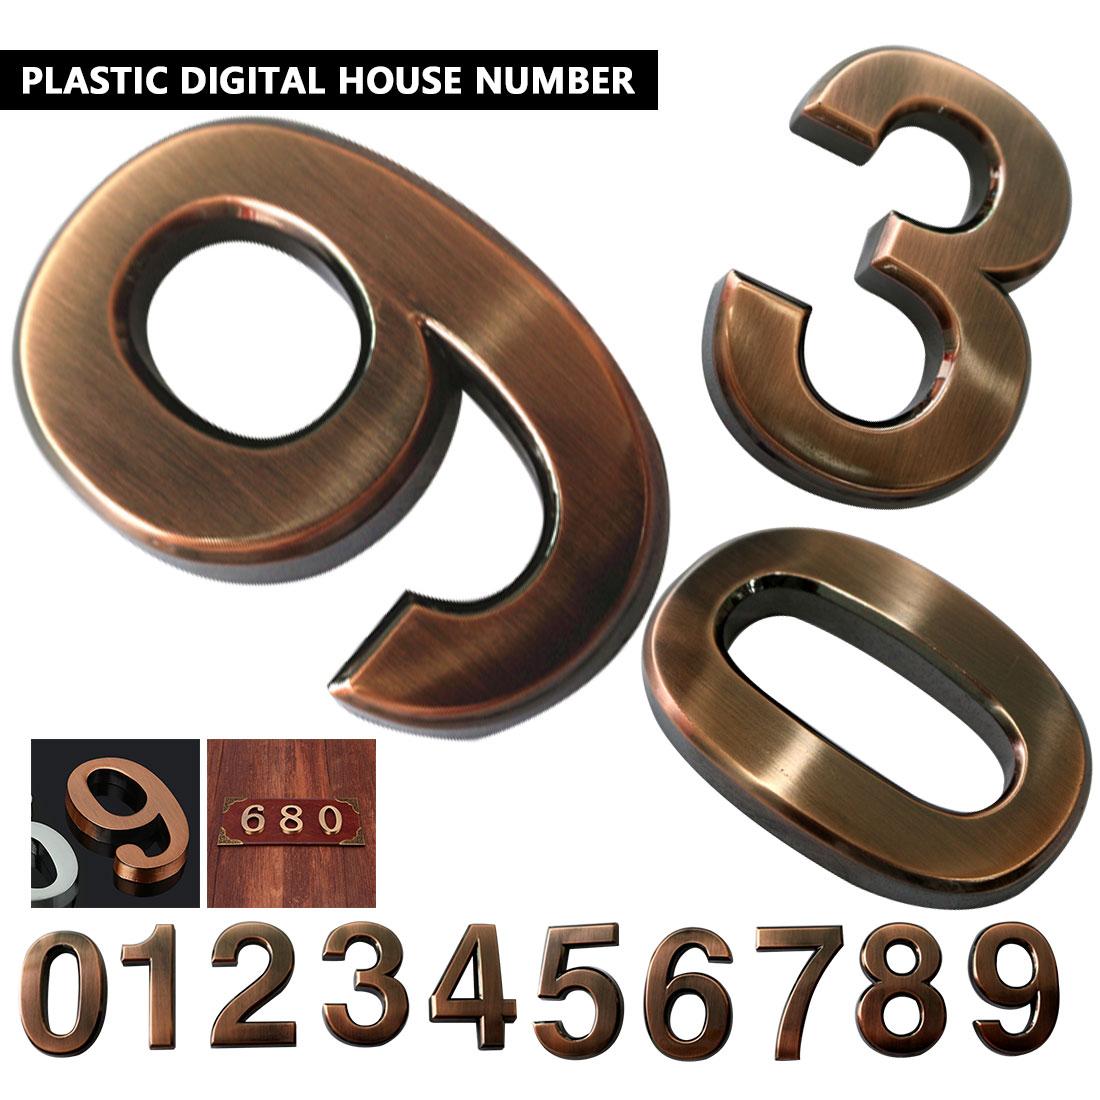 ABS Plastic Bronze Self- Adhesive 0-9 Door Numbers Customized House Address SignABS Plastic Bronze Self- Adhesive 0-9 Door Numbers Customized House Address Sign